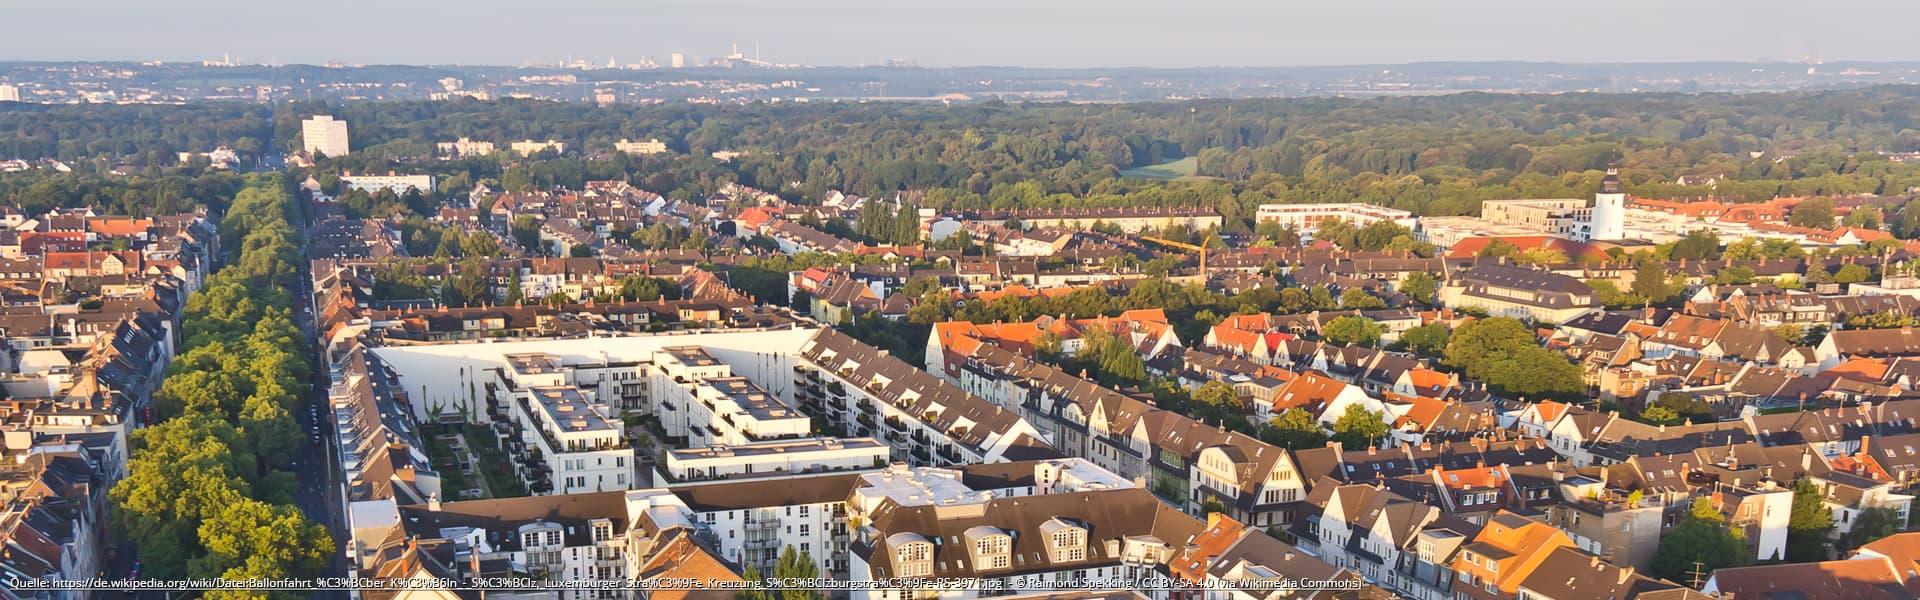 Köln Luxemburger Straße - Goost Immobilien